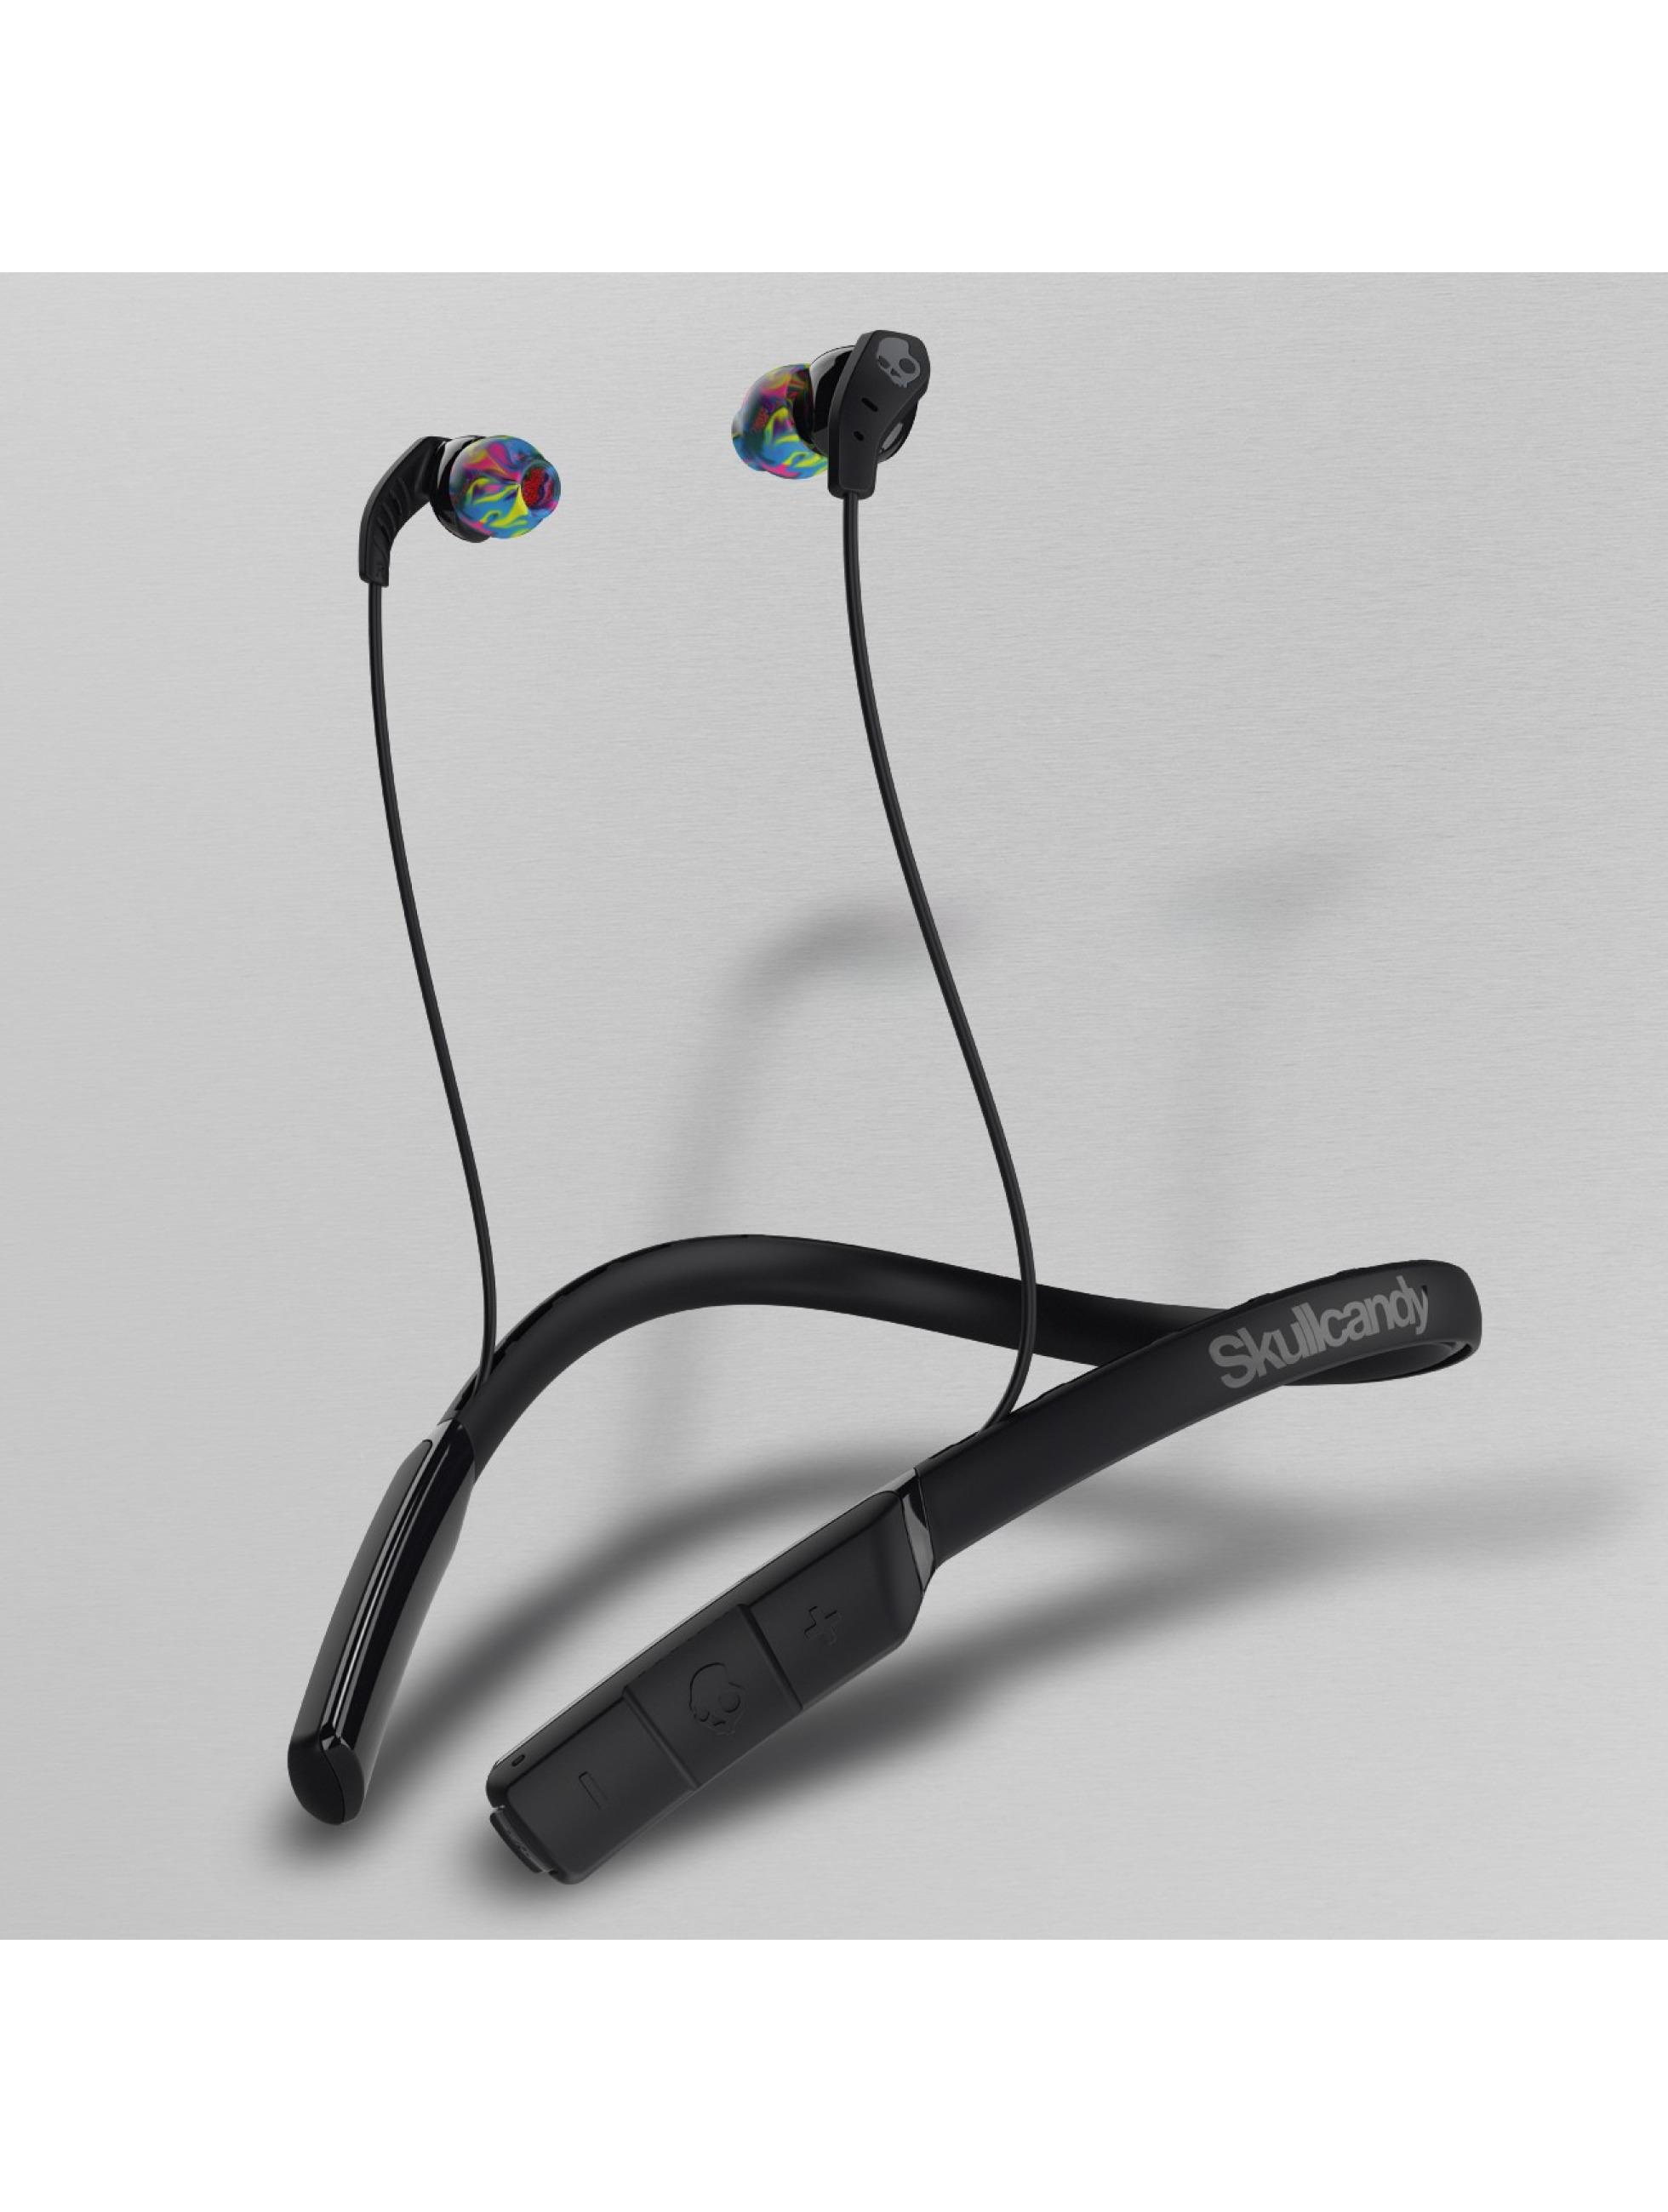 Skullcandy Männer,Frauen Kopfhörer Method Wireless in schwarz